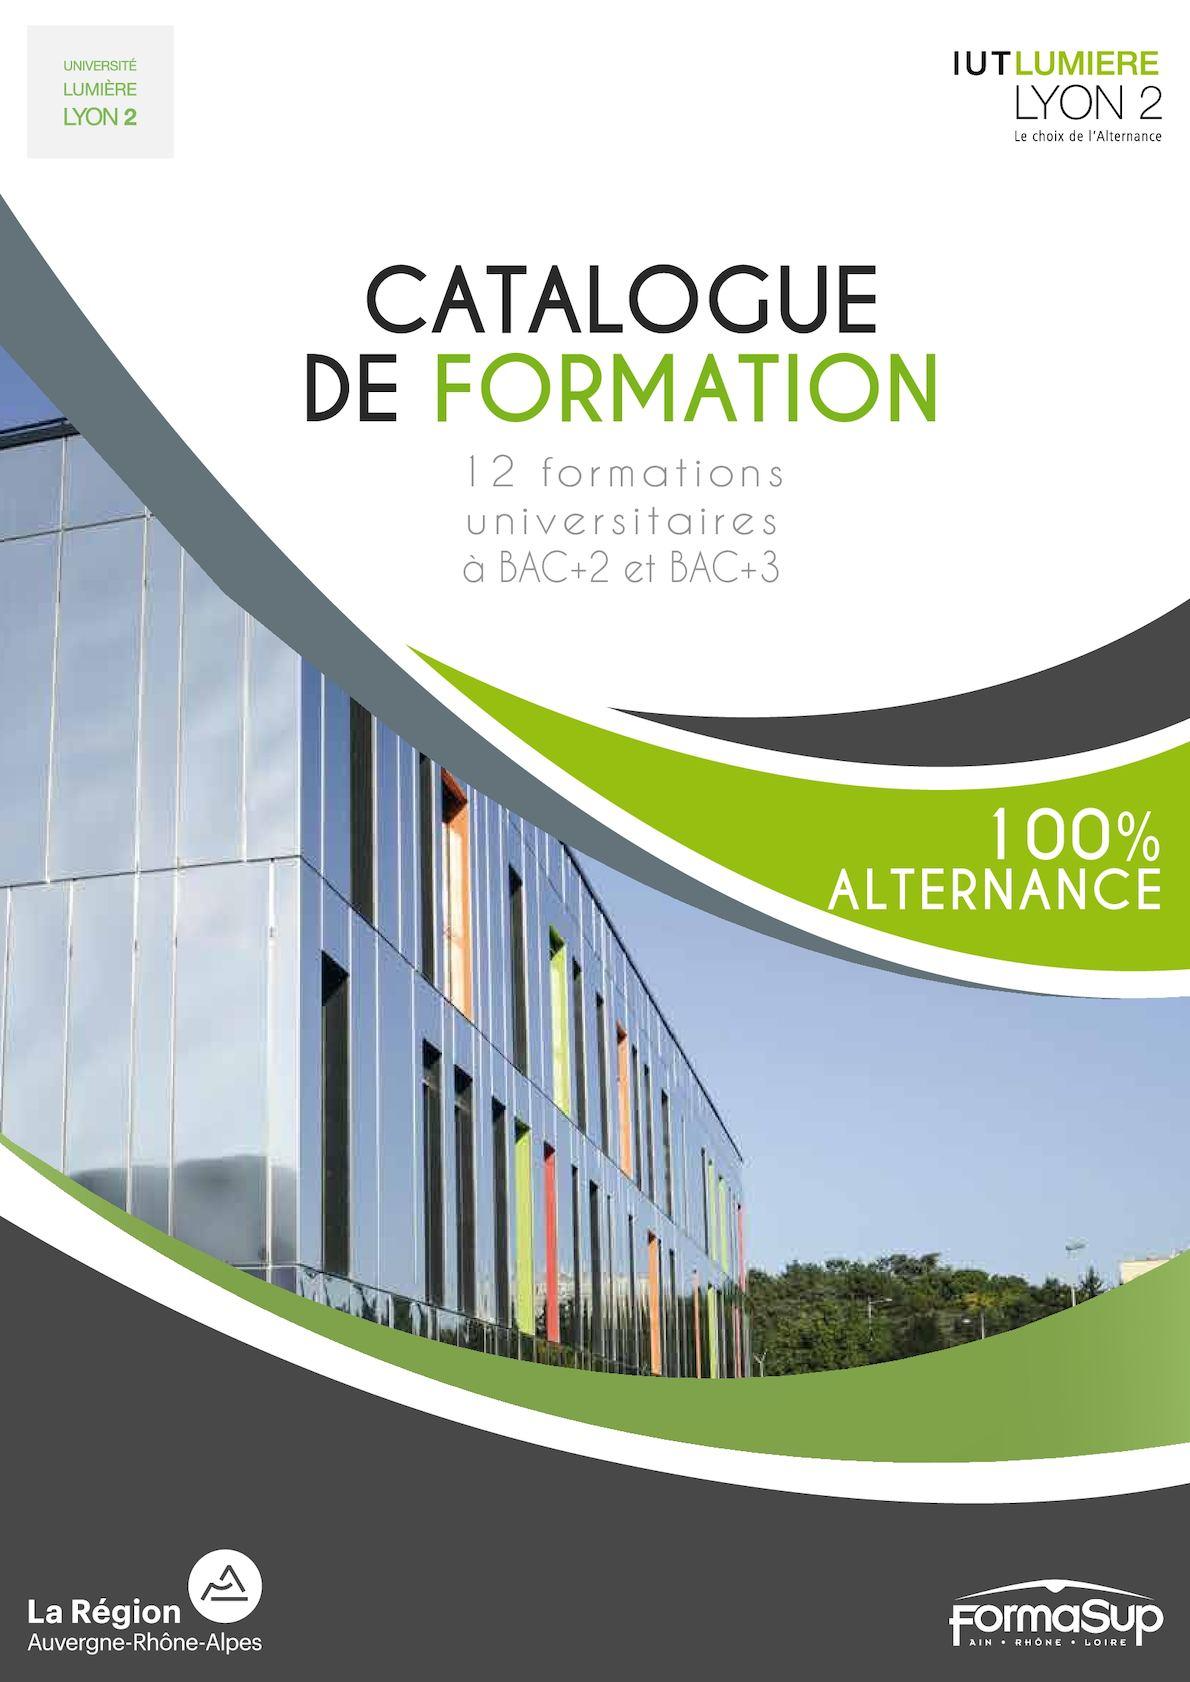 CATALOGUE FORMATIONS 2017 - IUT LUMIÈRE